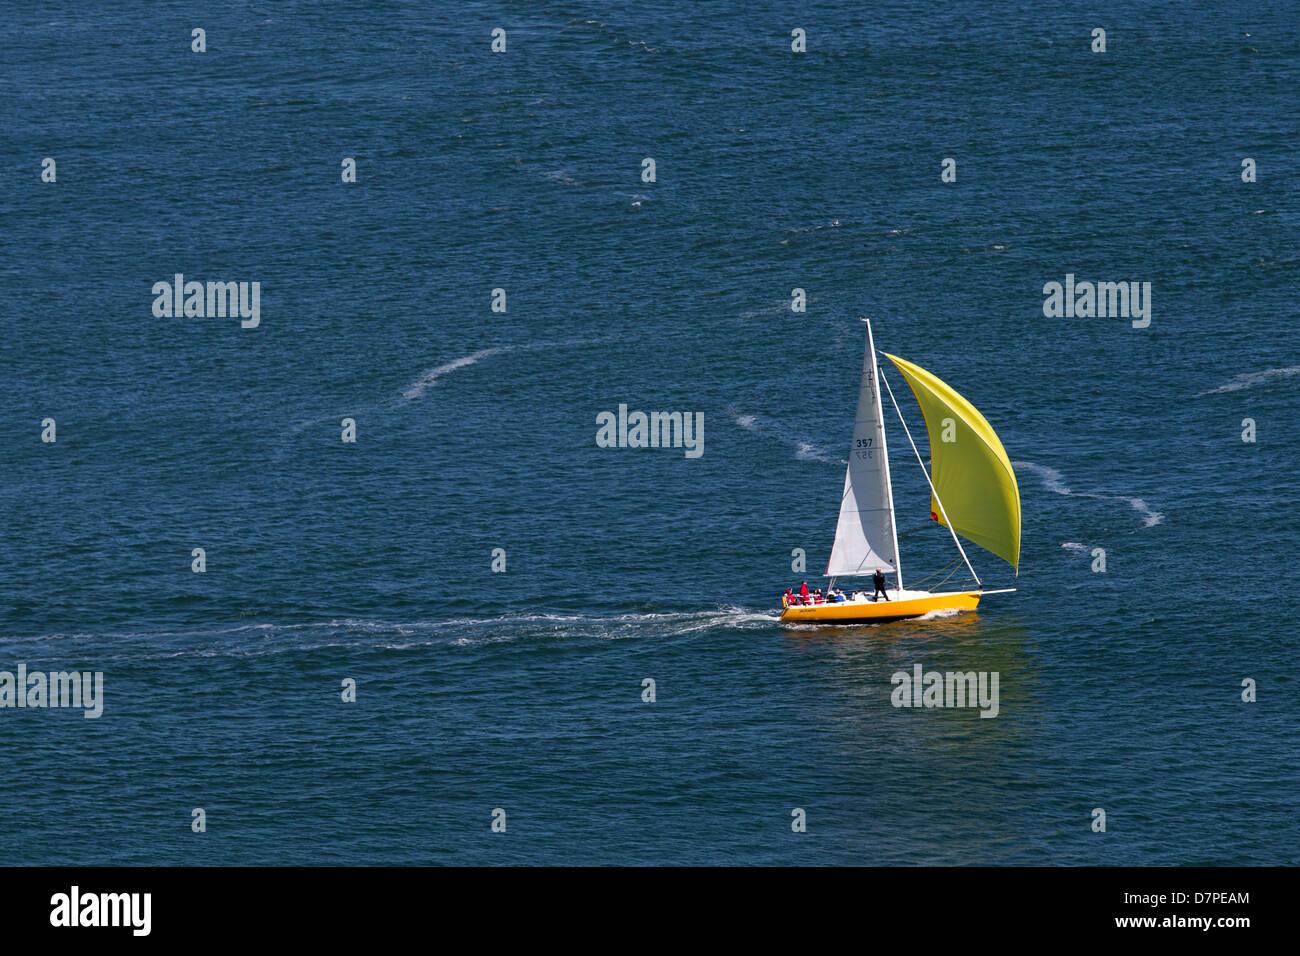 Yacht sailing in San Francisco Bay, California, USA. - Stock Image